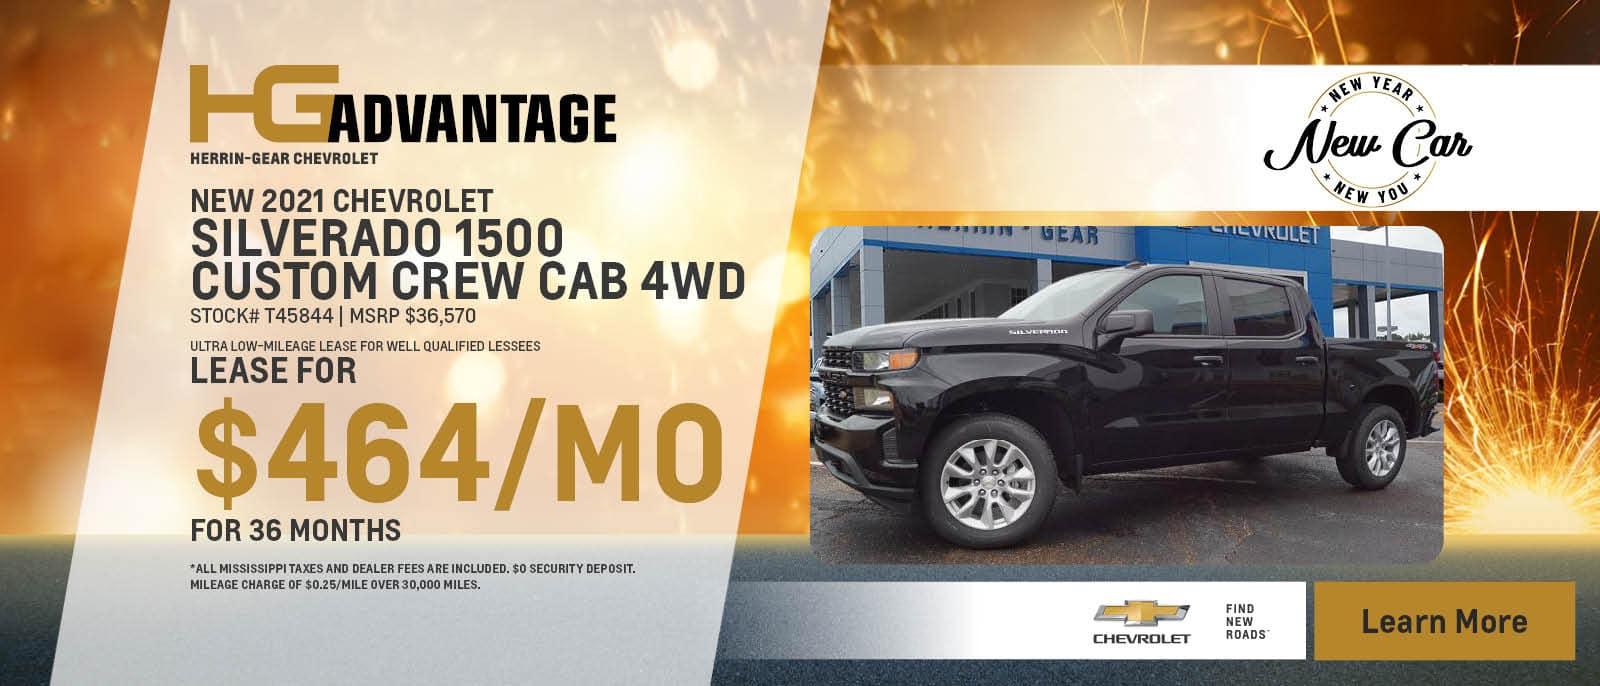 Herrin Gear Chevrolet_11355_00010437_UX_HPB_Silverado